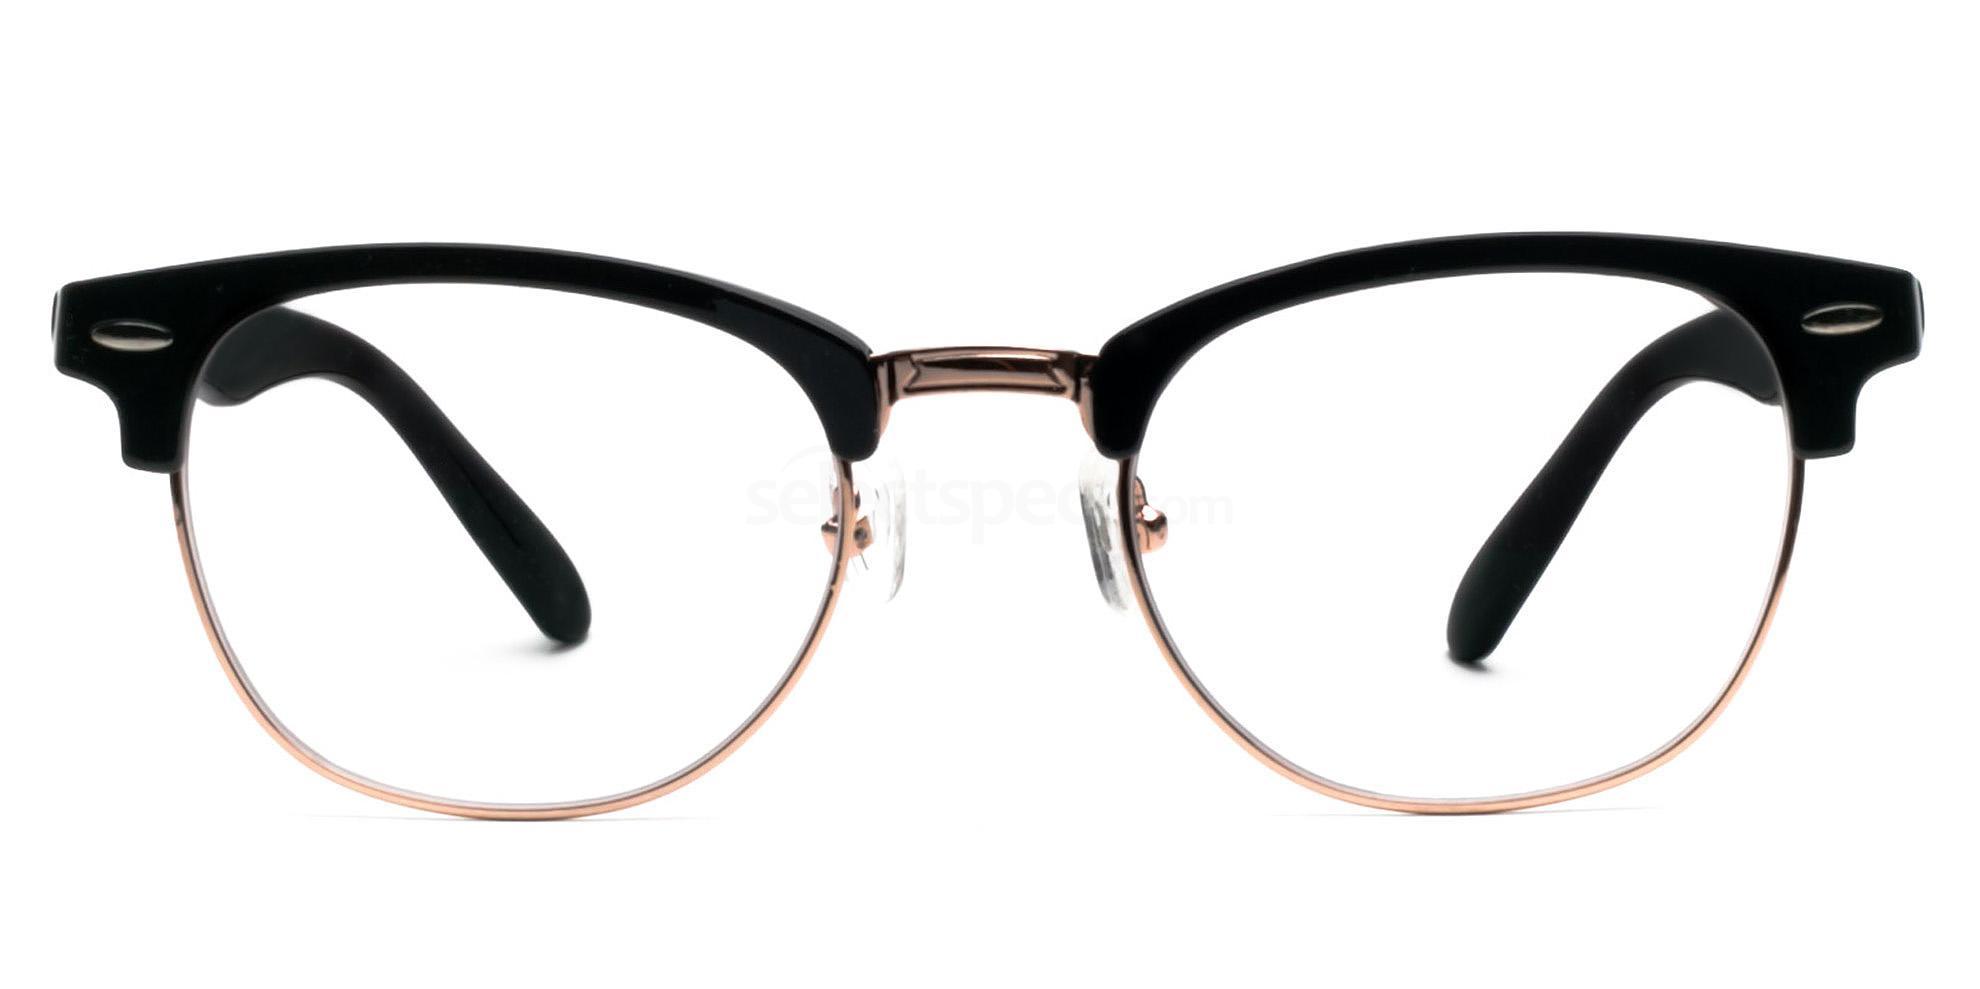 Hallmark-Clubmaster-Style-Prescription-Glasses-SelectSpecs